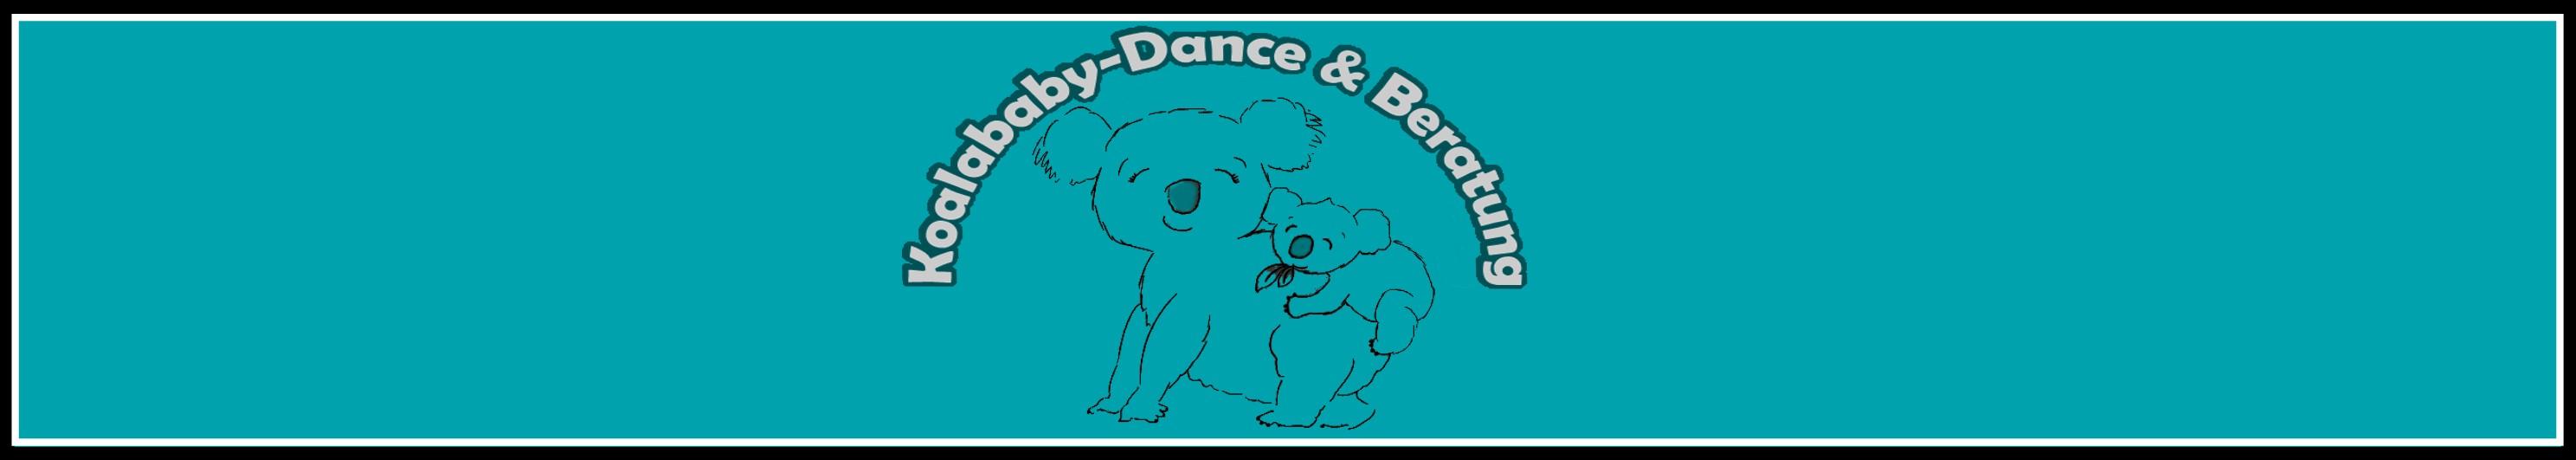 Koalababy Dance & Beratung